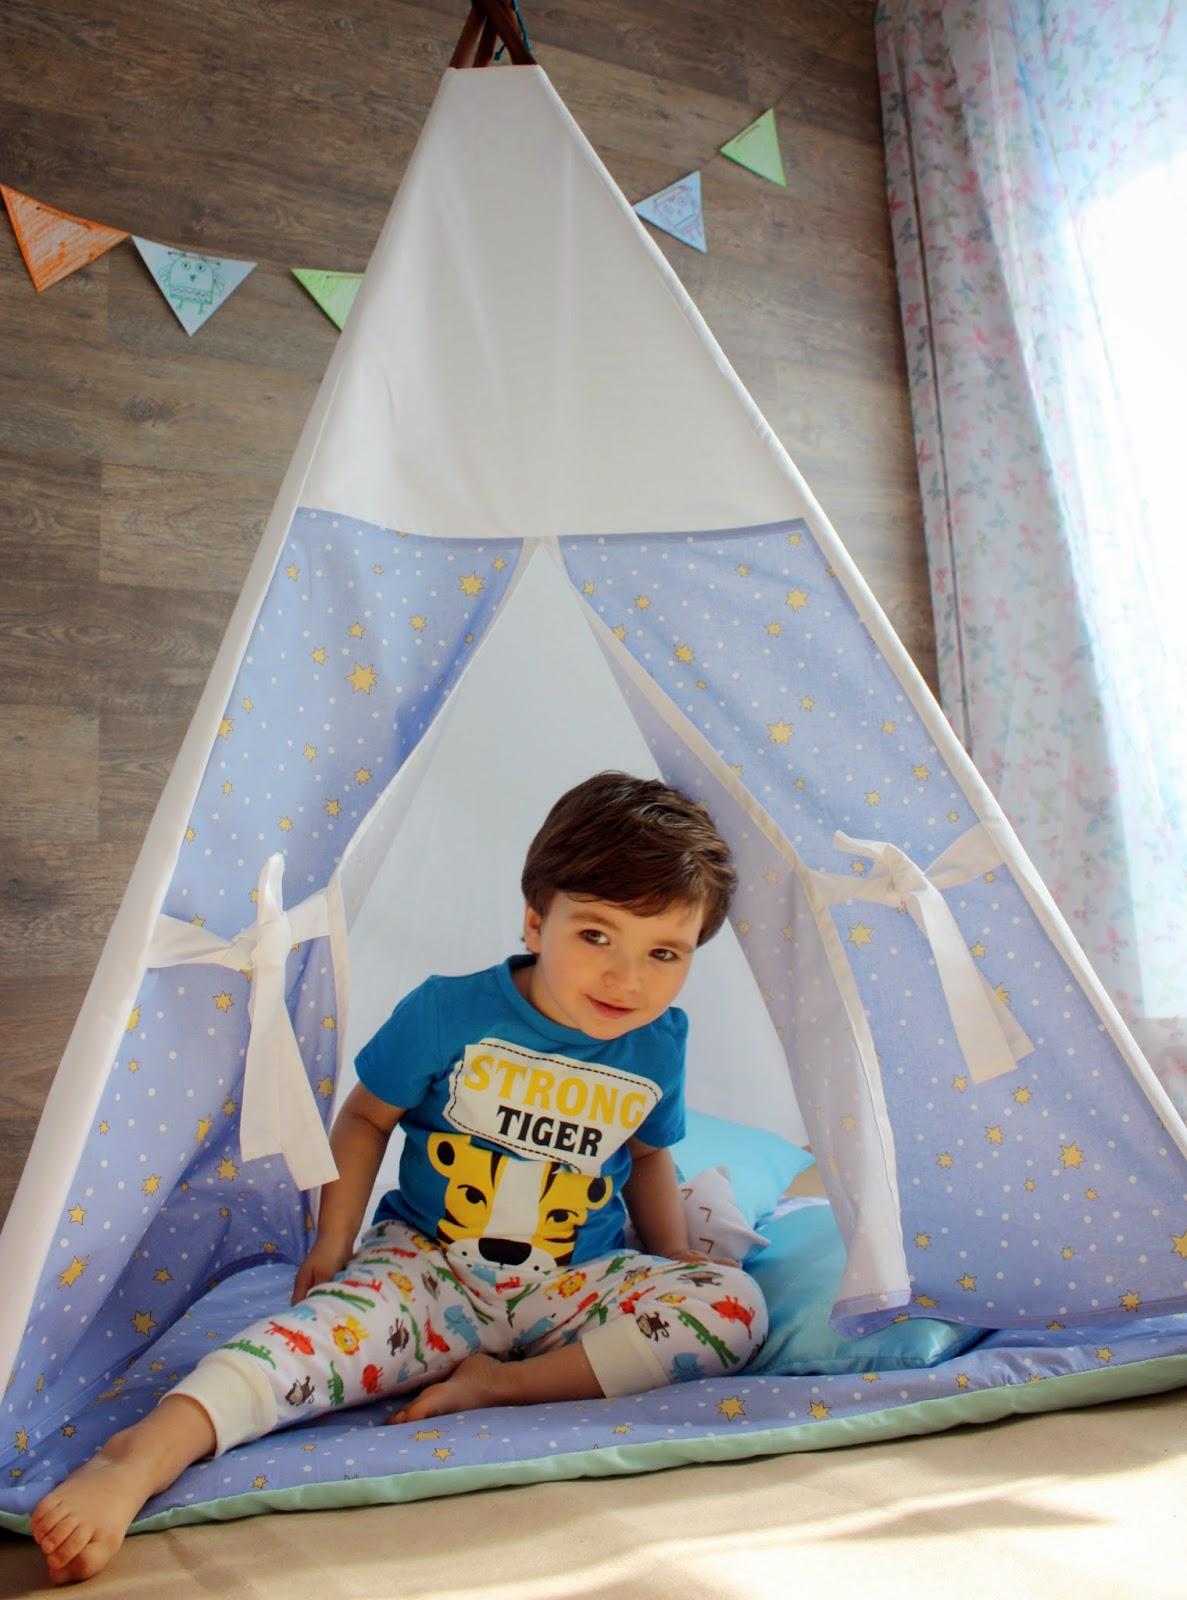 типи, детский вигвам, детский домик, шатер, шалаш